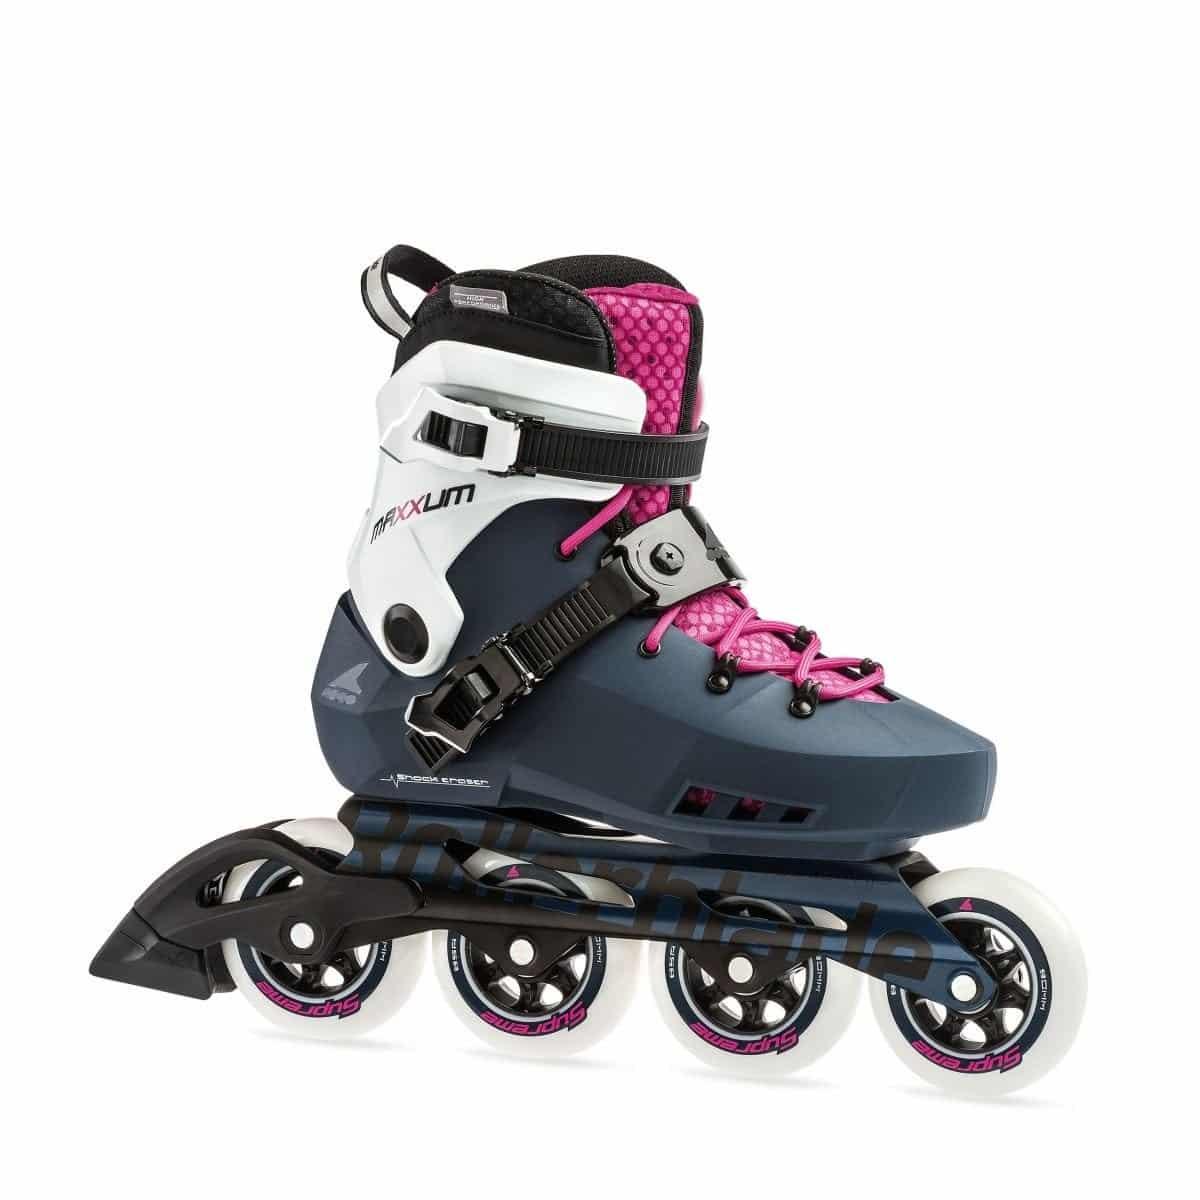 rollerblade maxxum edge 90 w 2020